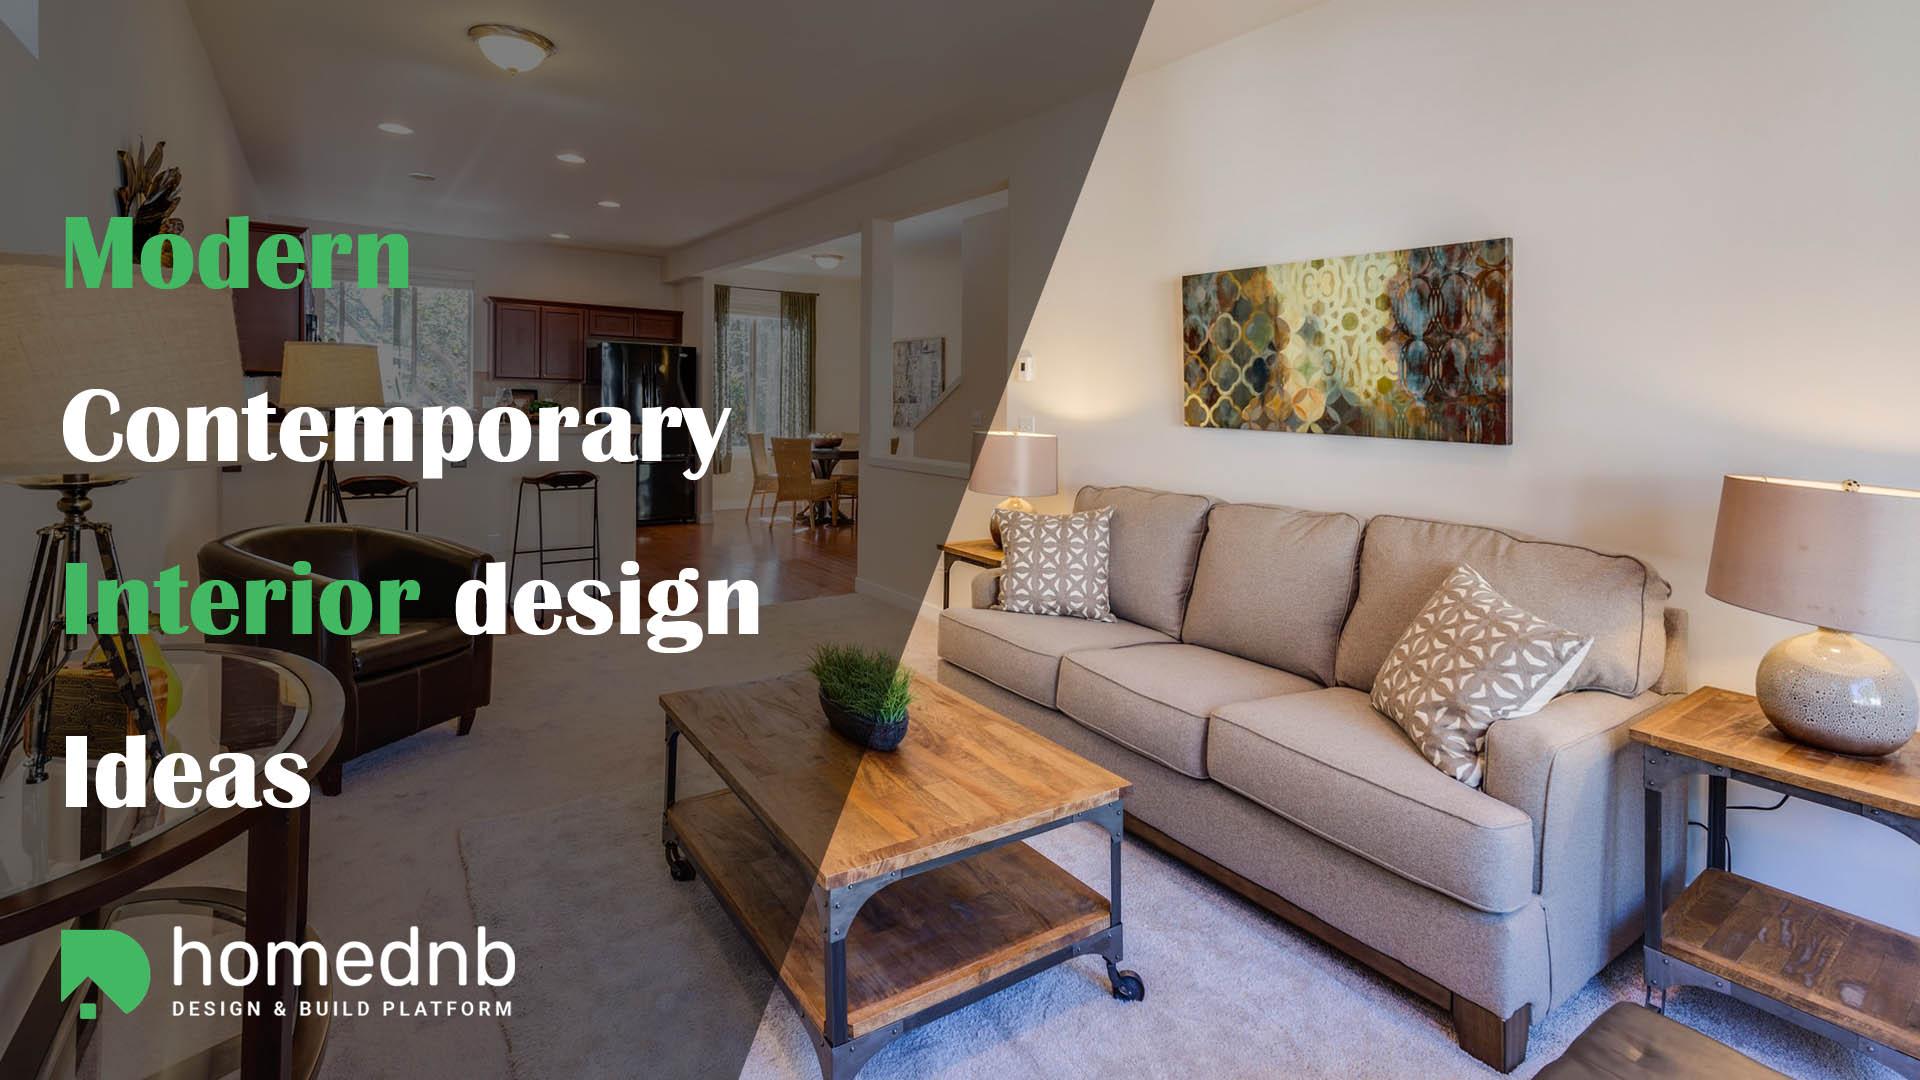 Home Additions - Modern Contemporary Interior design Ideas